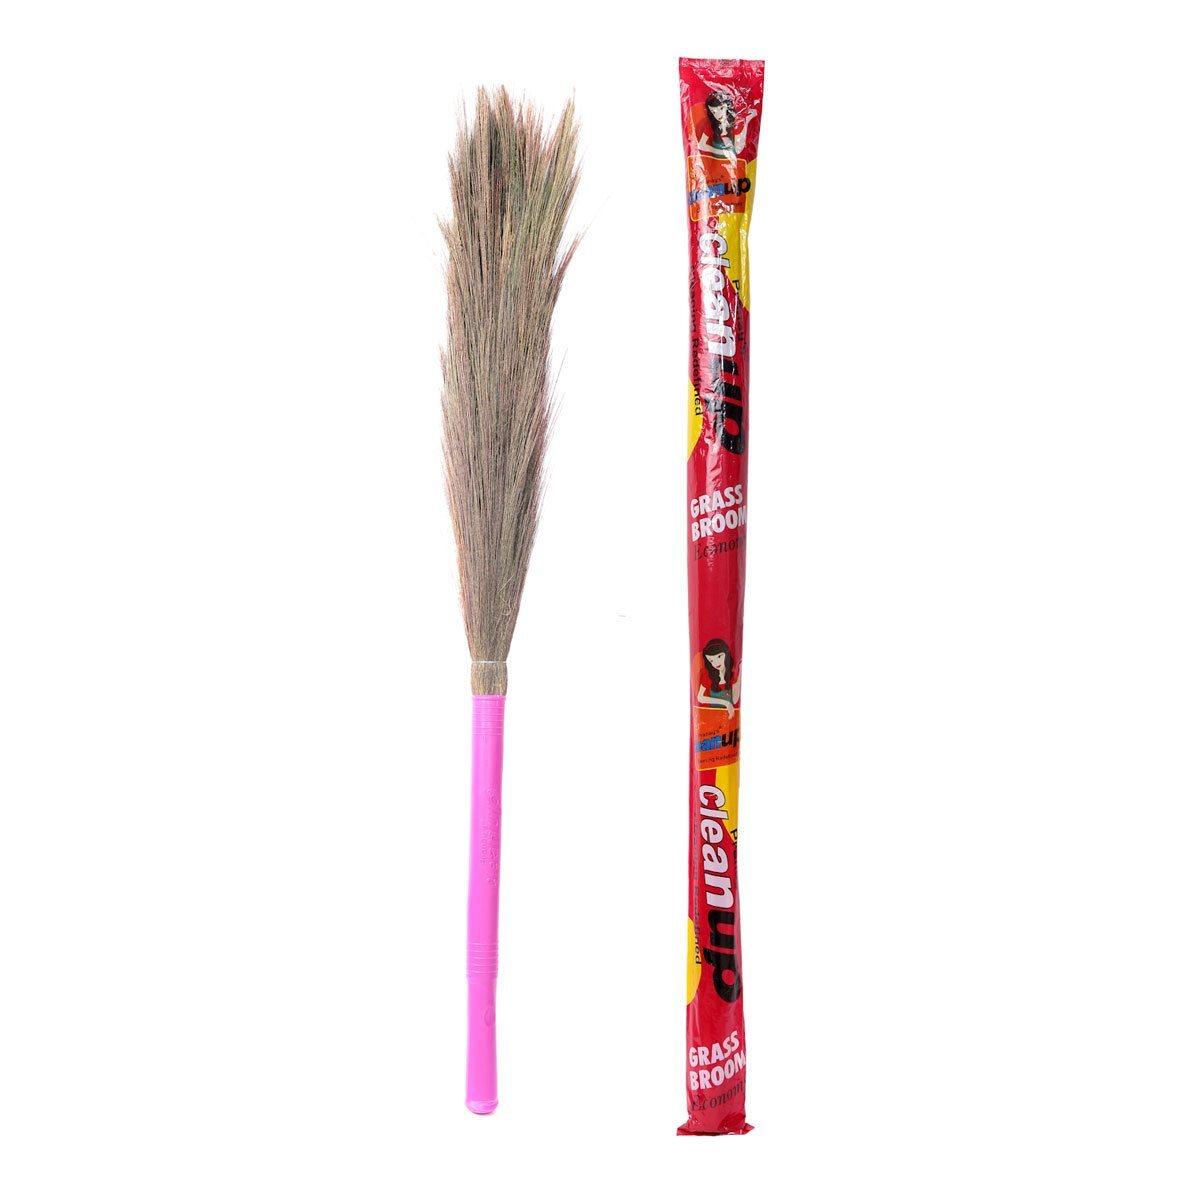 Grass Broom Economy